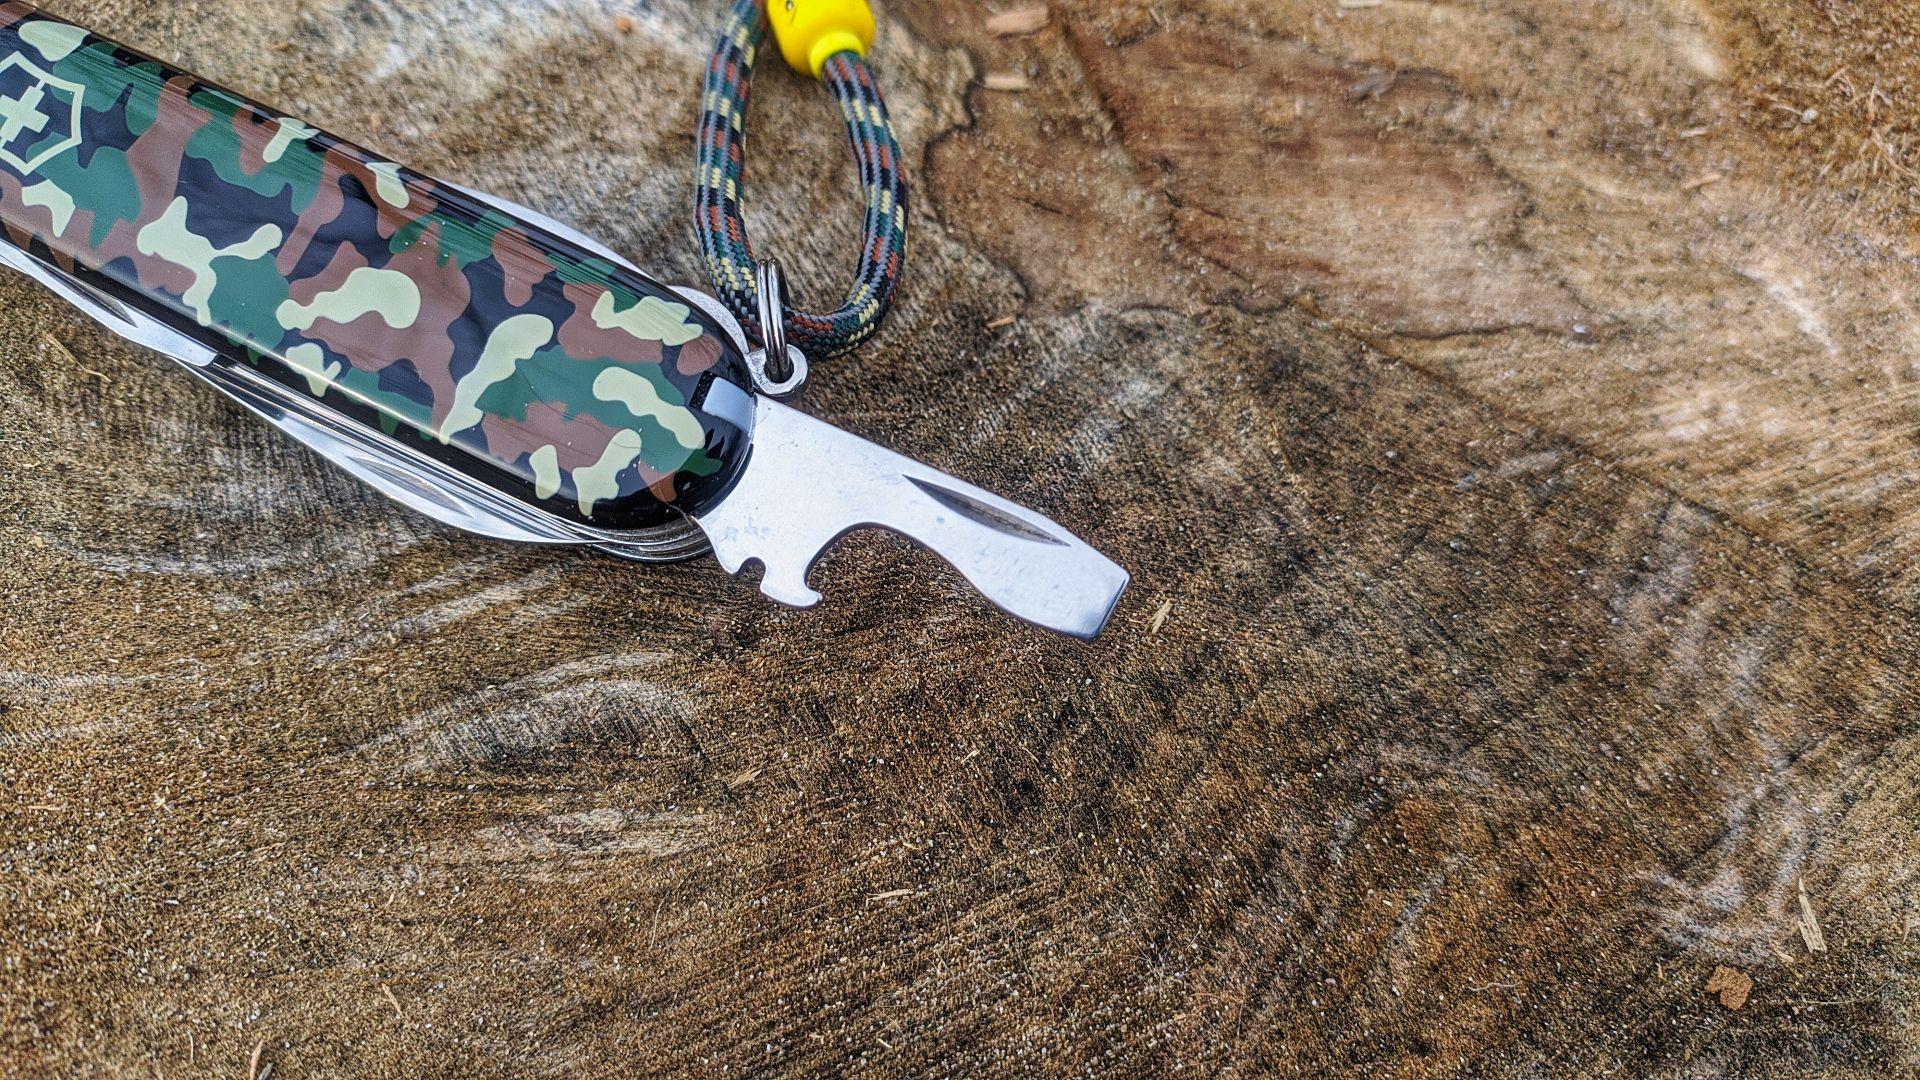 Victorinox_Huntsman_Camo_Camouflage_art_n_1.3713_maxgearedc.com_EDC_GEAR_OUTDOOR_TESTING_and_SHORT_REVIEWS_5